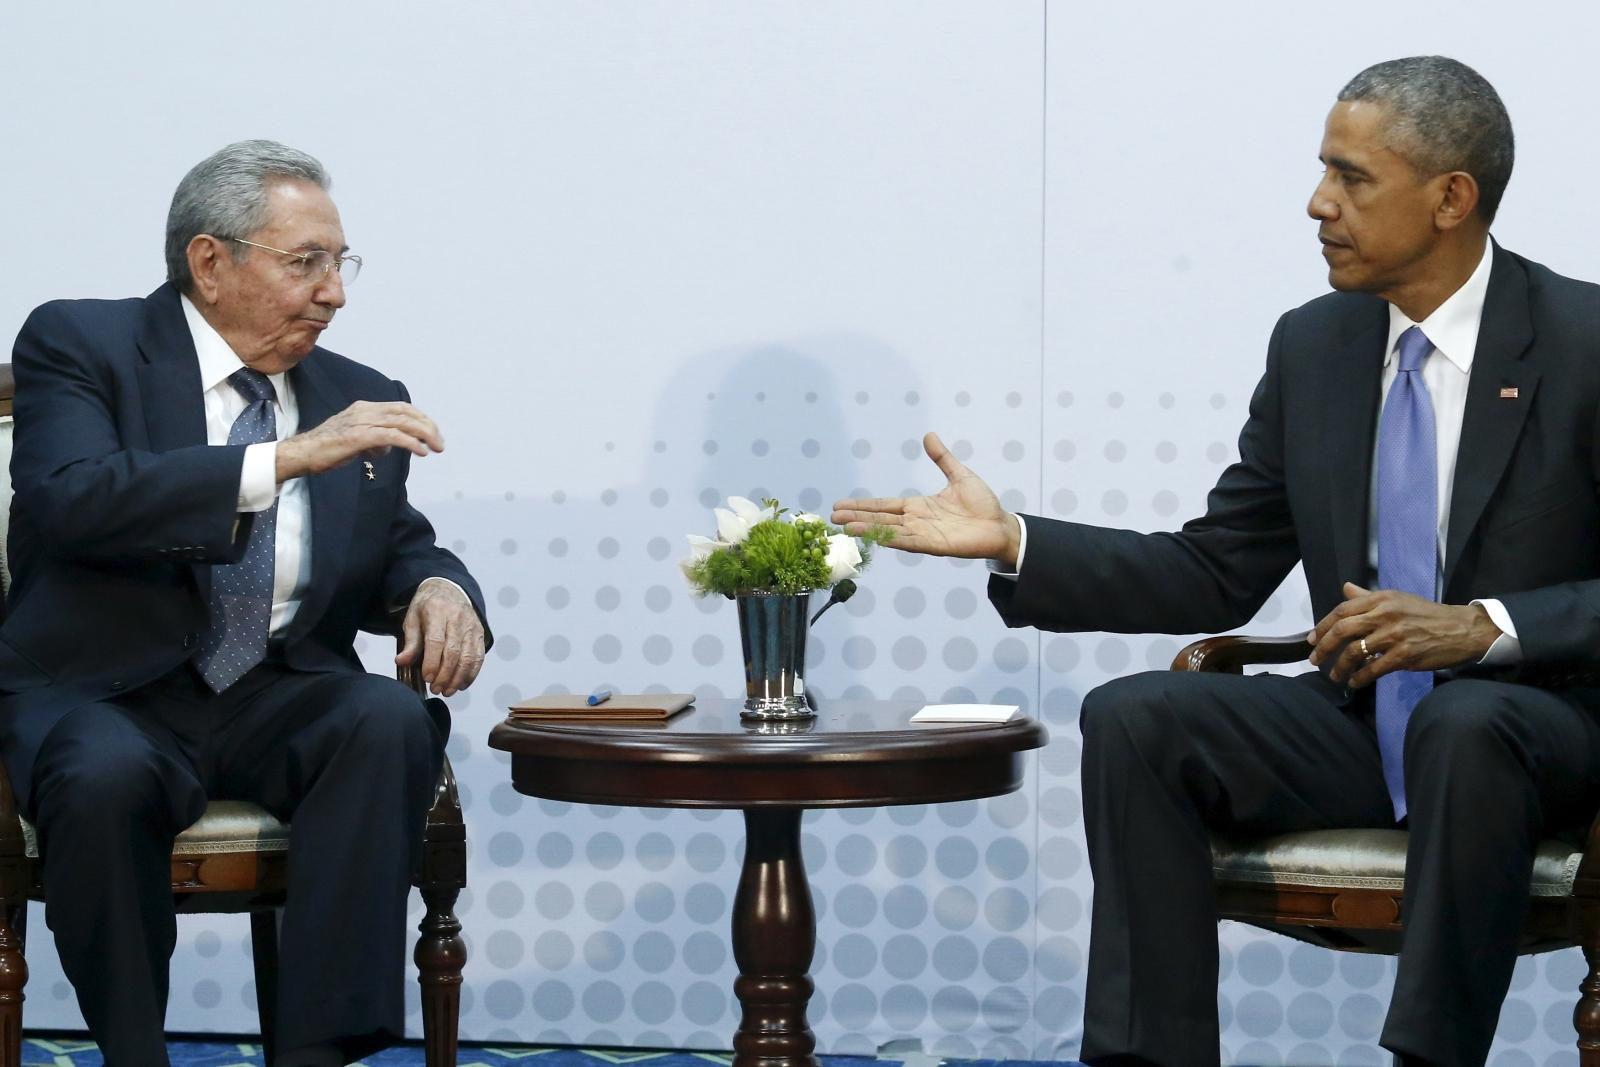 US-Cuba relations